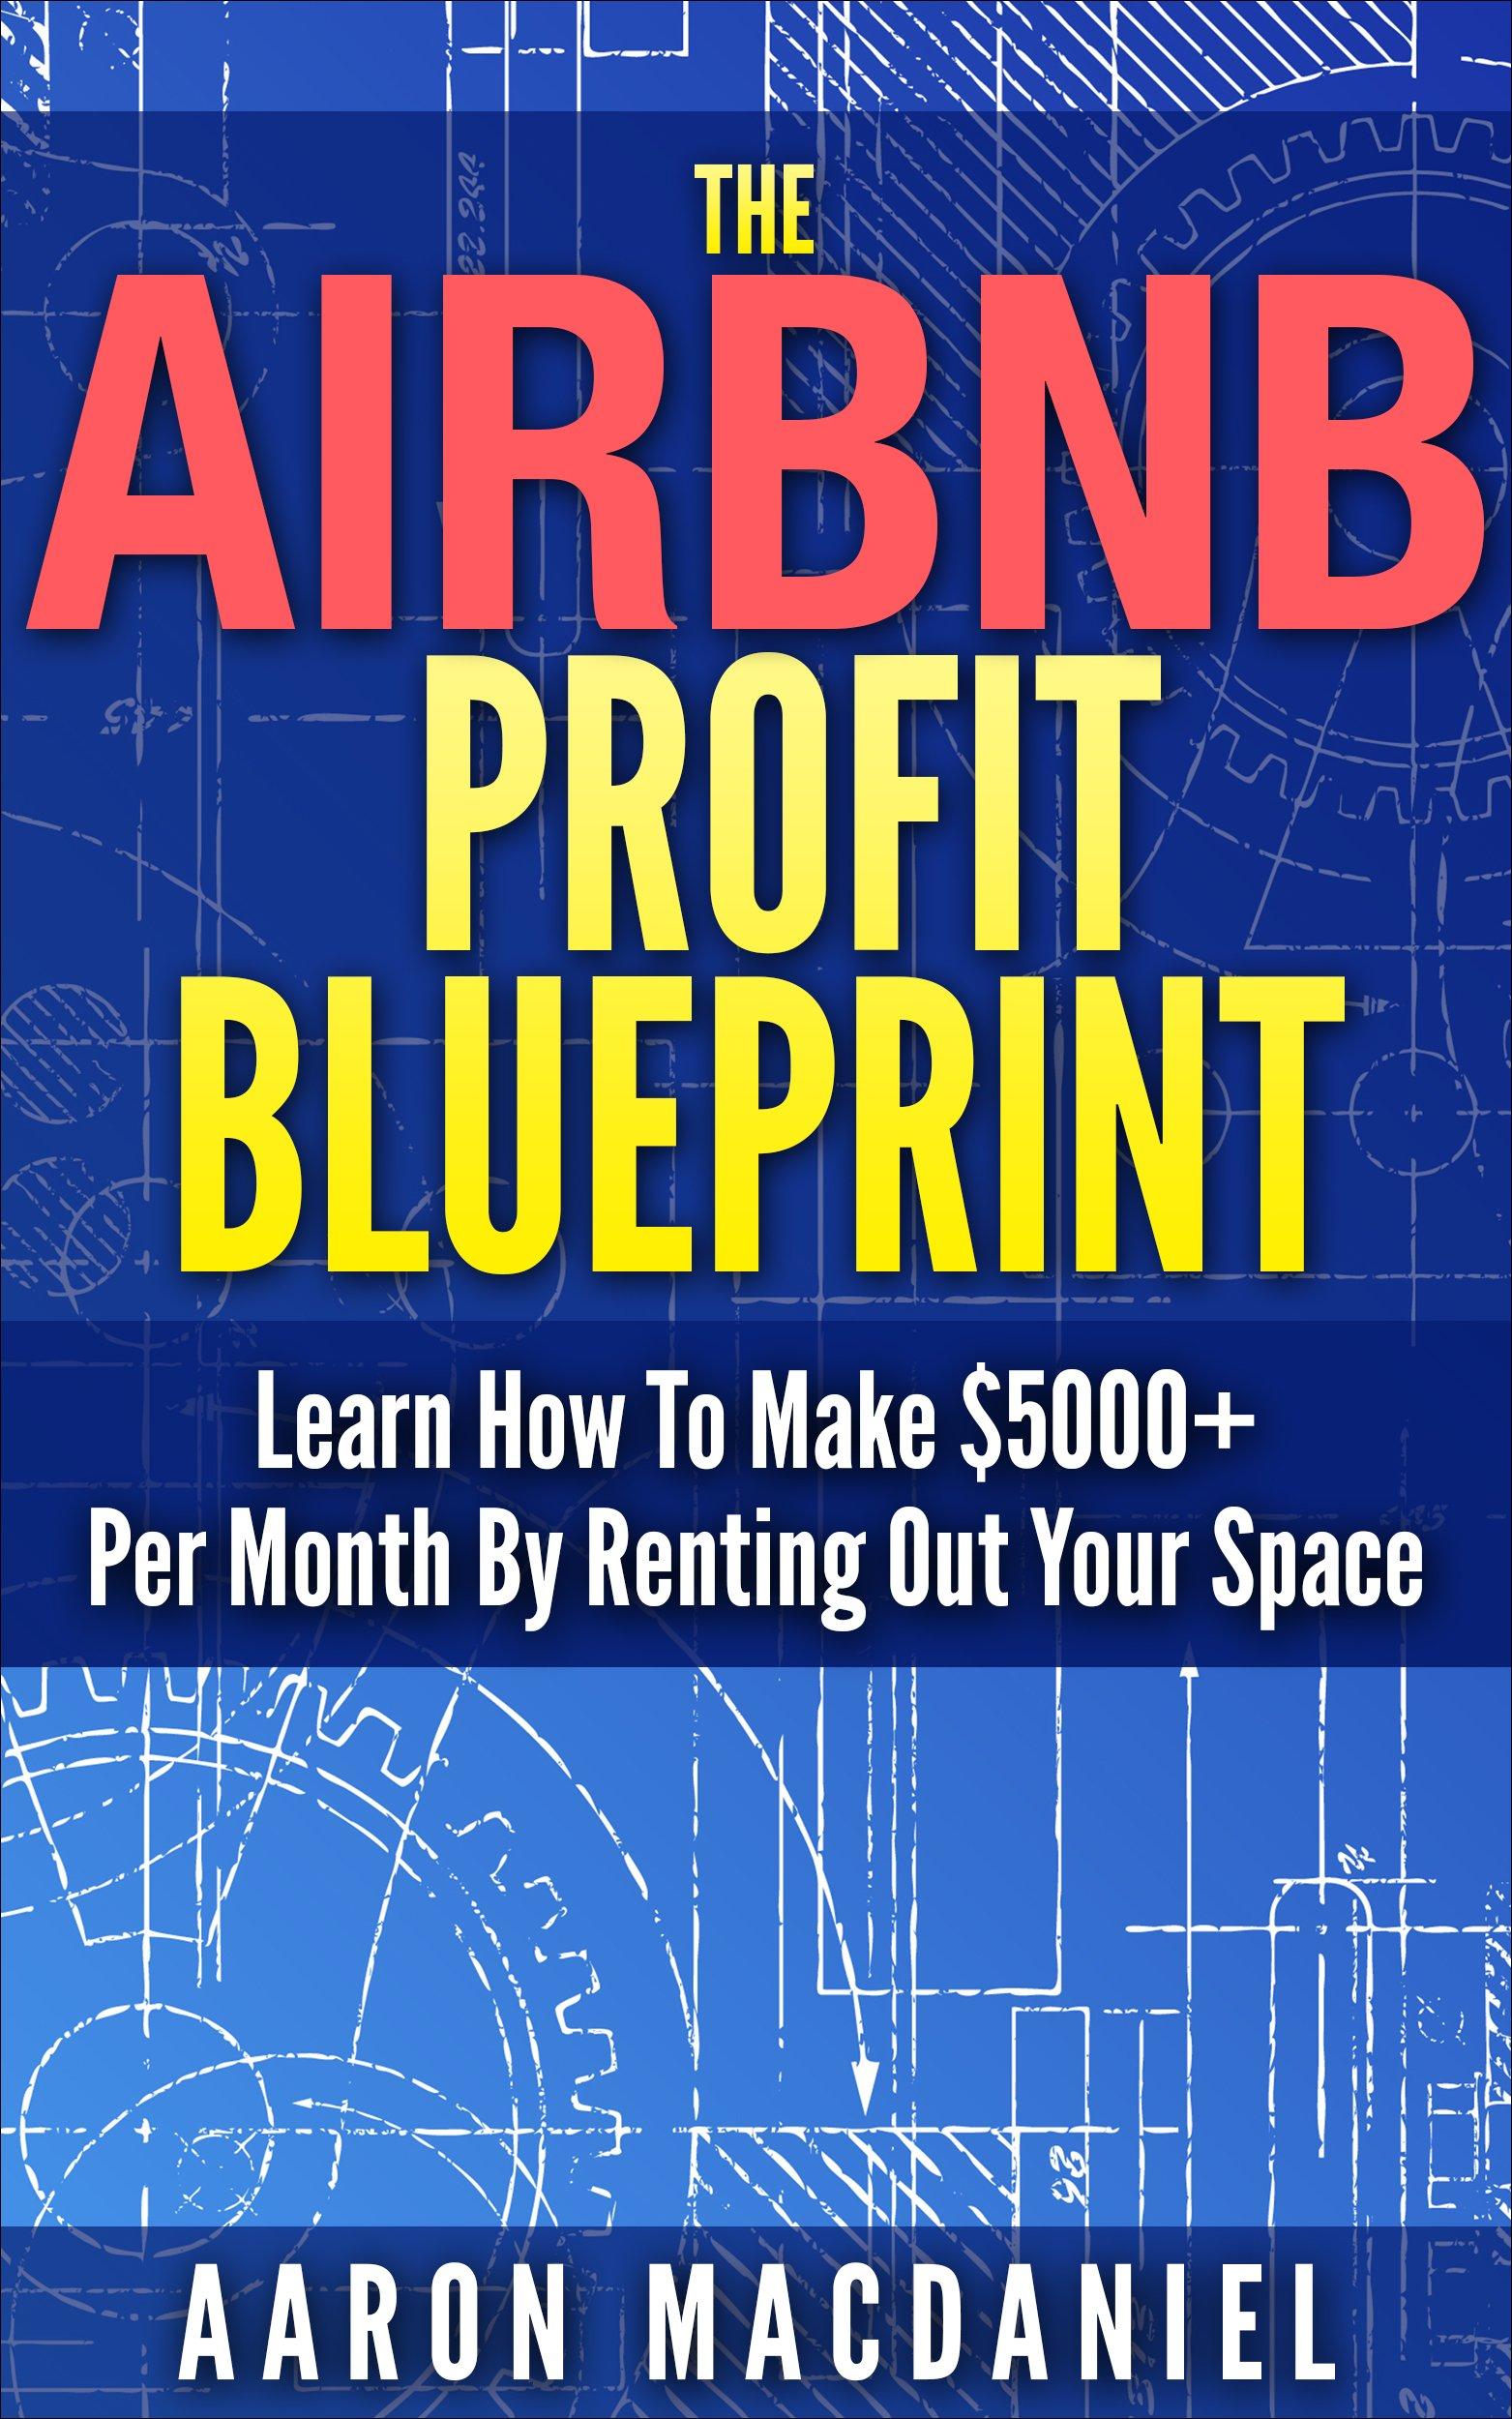 The Airbnb Profit Blueprint